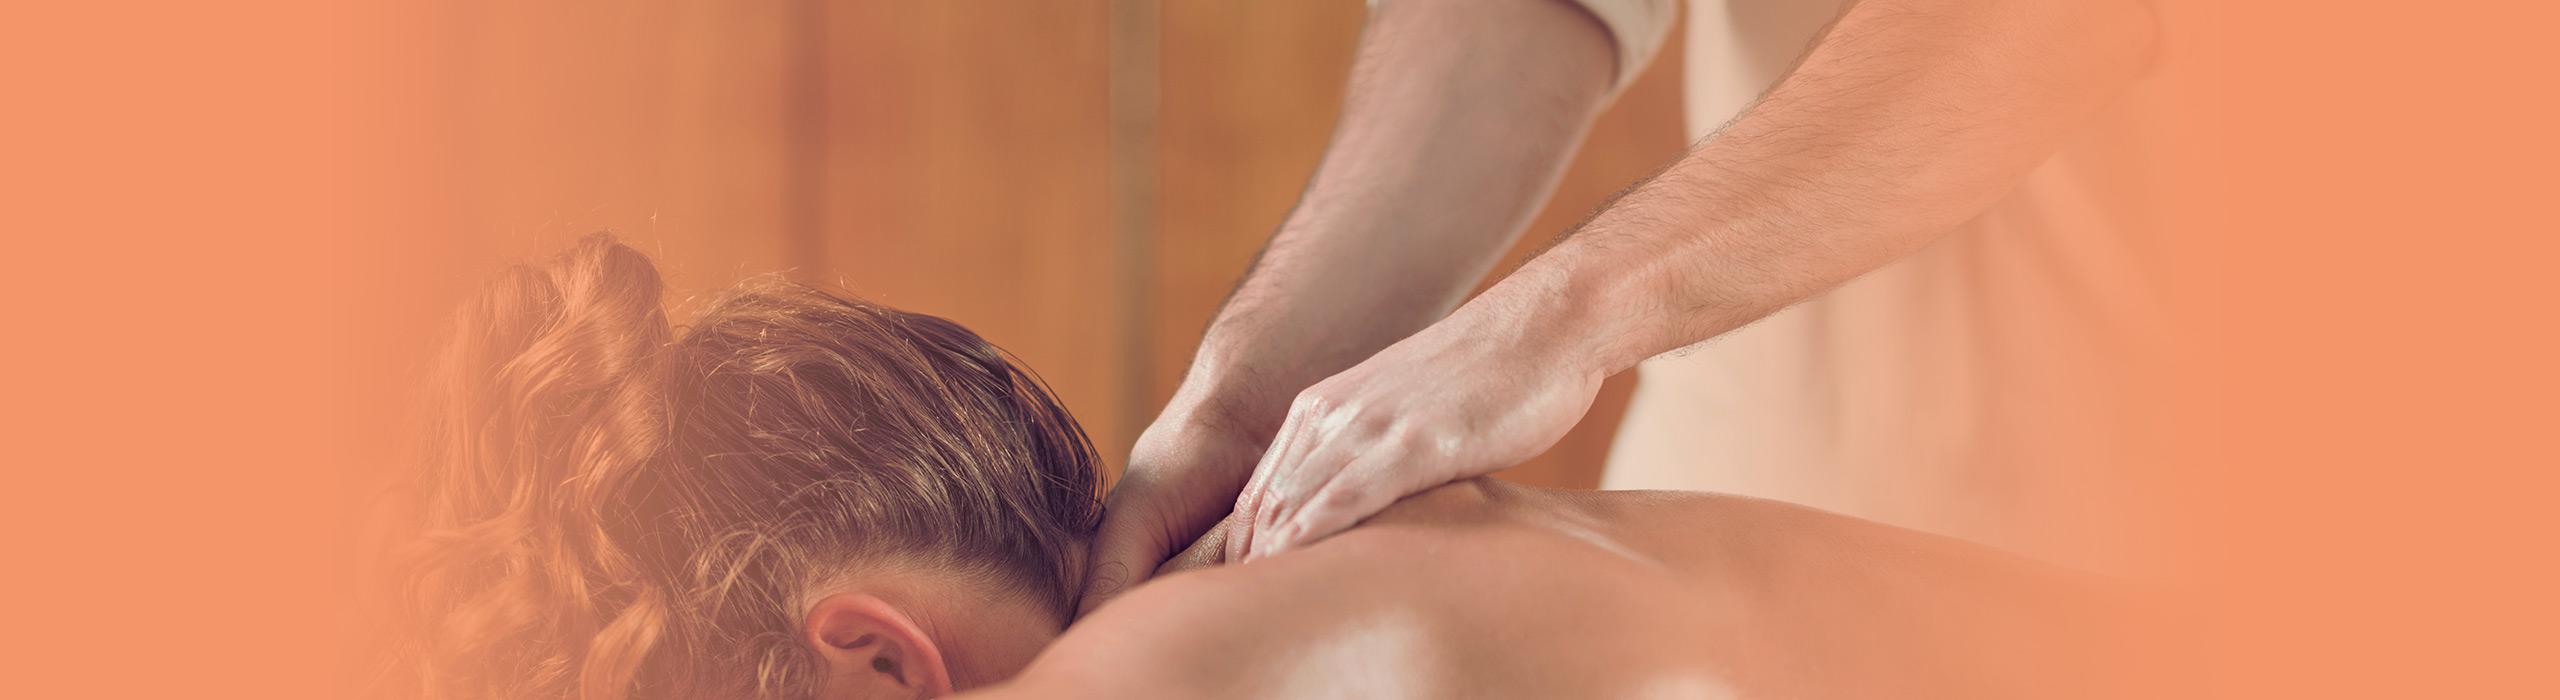 2016/06/massage.jpg